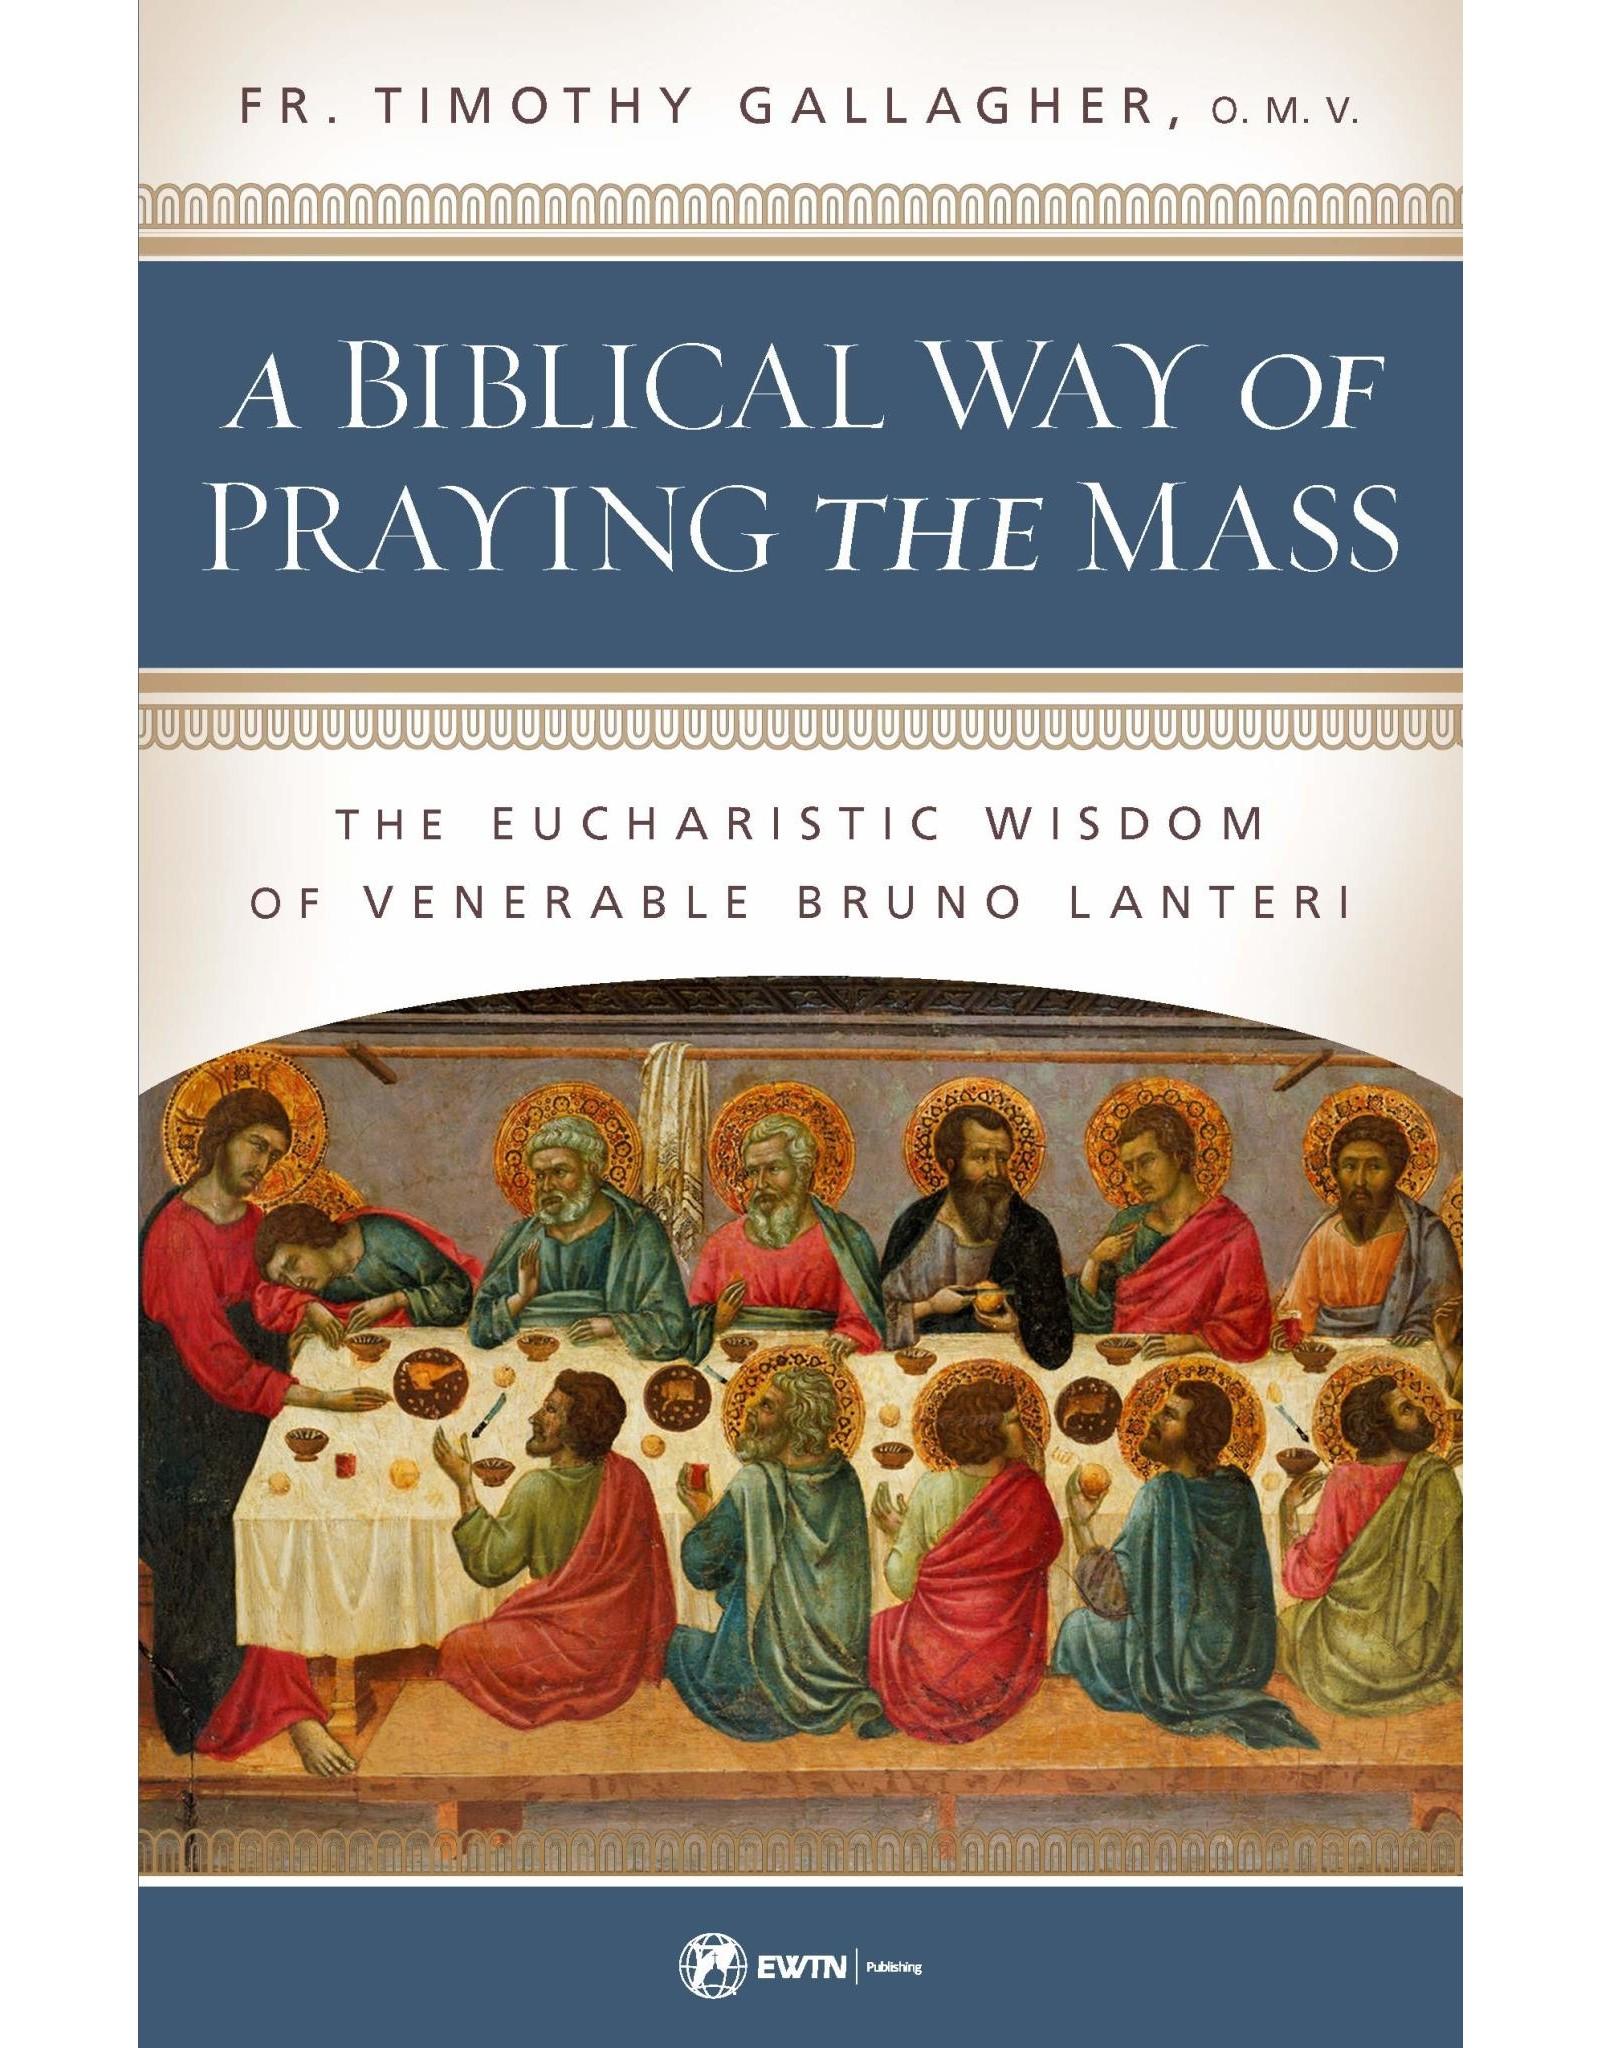 Biblical Way of Praying the Mass, A: The Eucharistic Wisdom of Venerable Bruno Lanteri